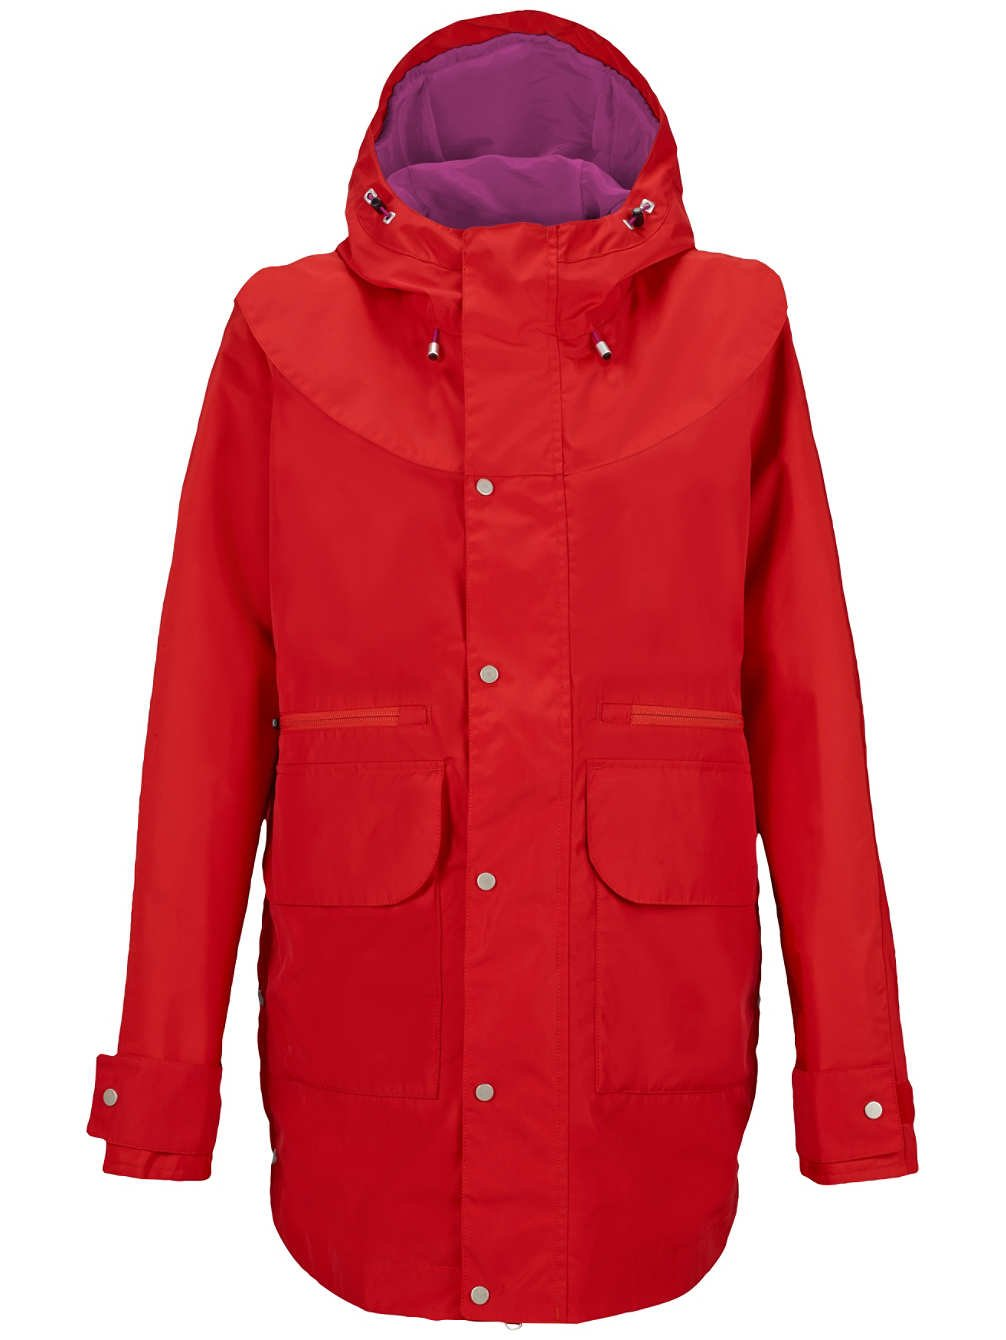 Damen Snowboard Jacke Burton Maddox Jacket kaufen